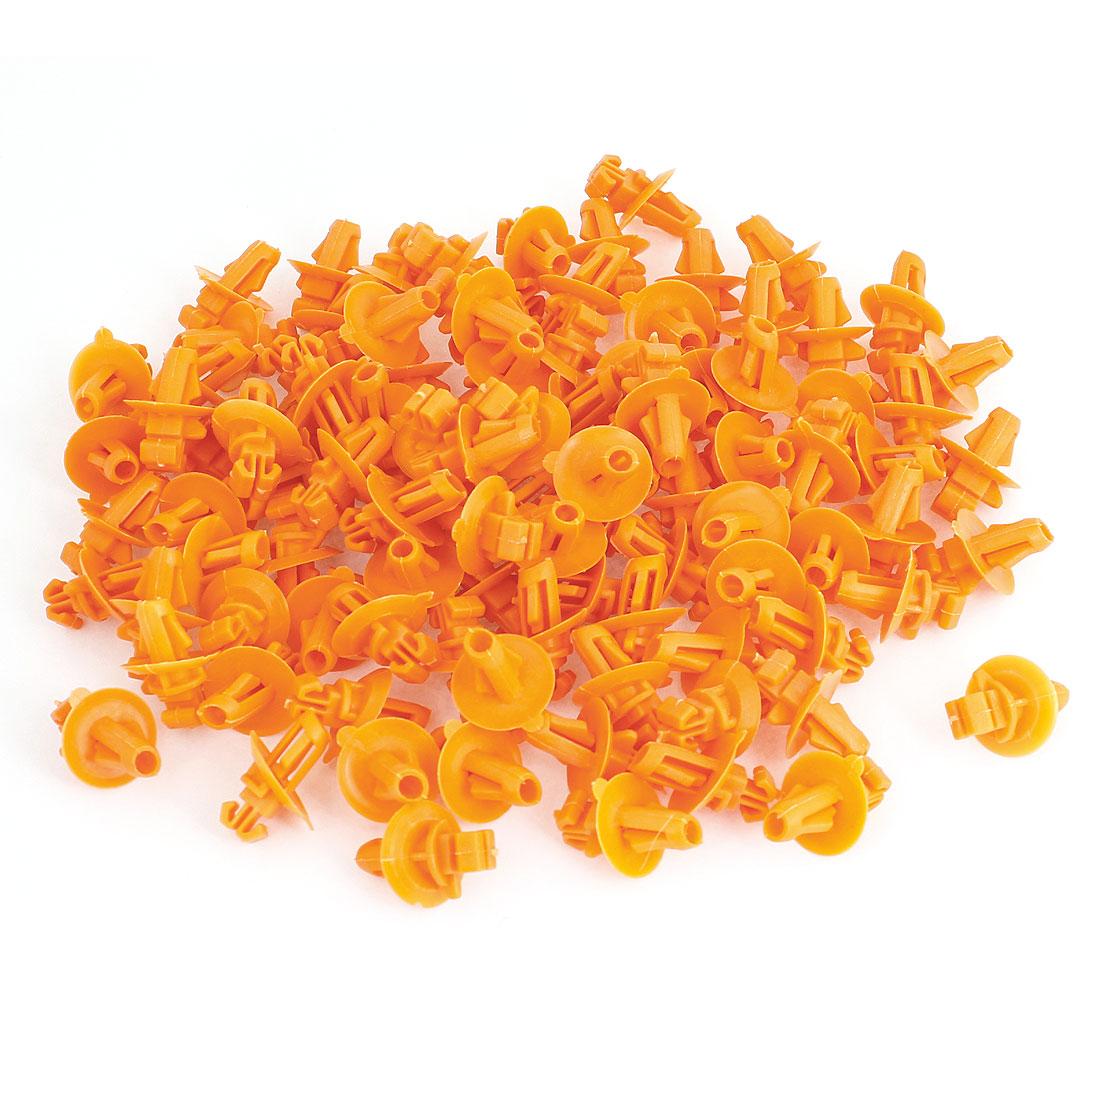 100 Pcs Orange Plastic Rivet Door Push Clips 7mm Hole for Toyota